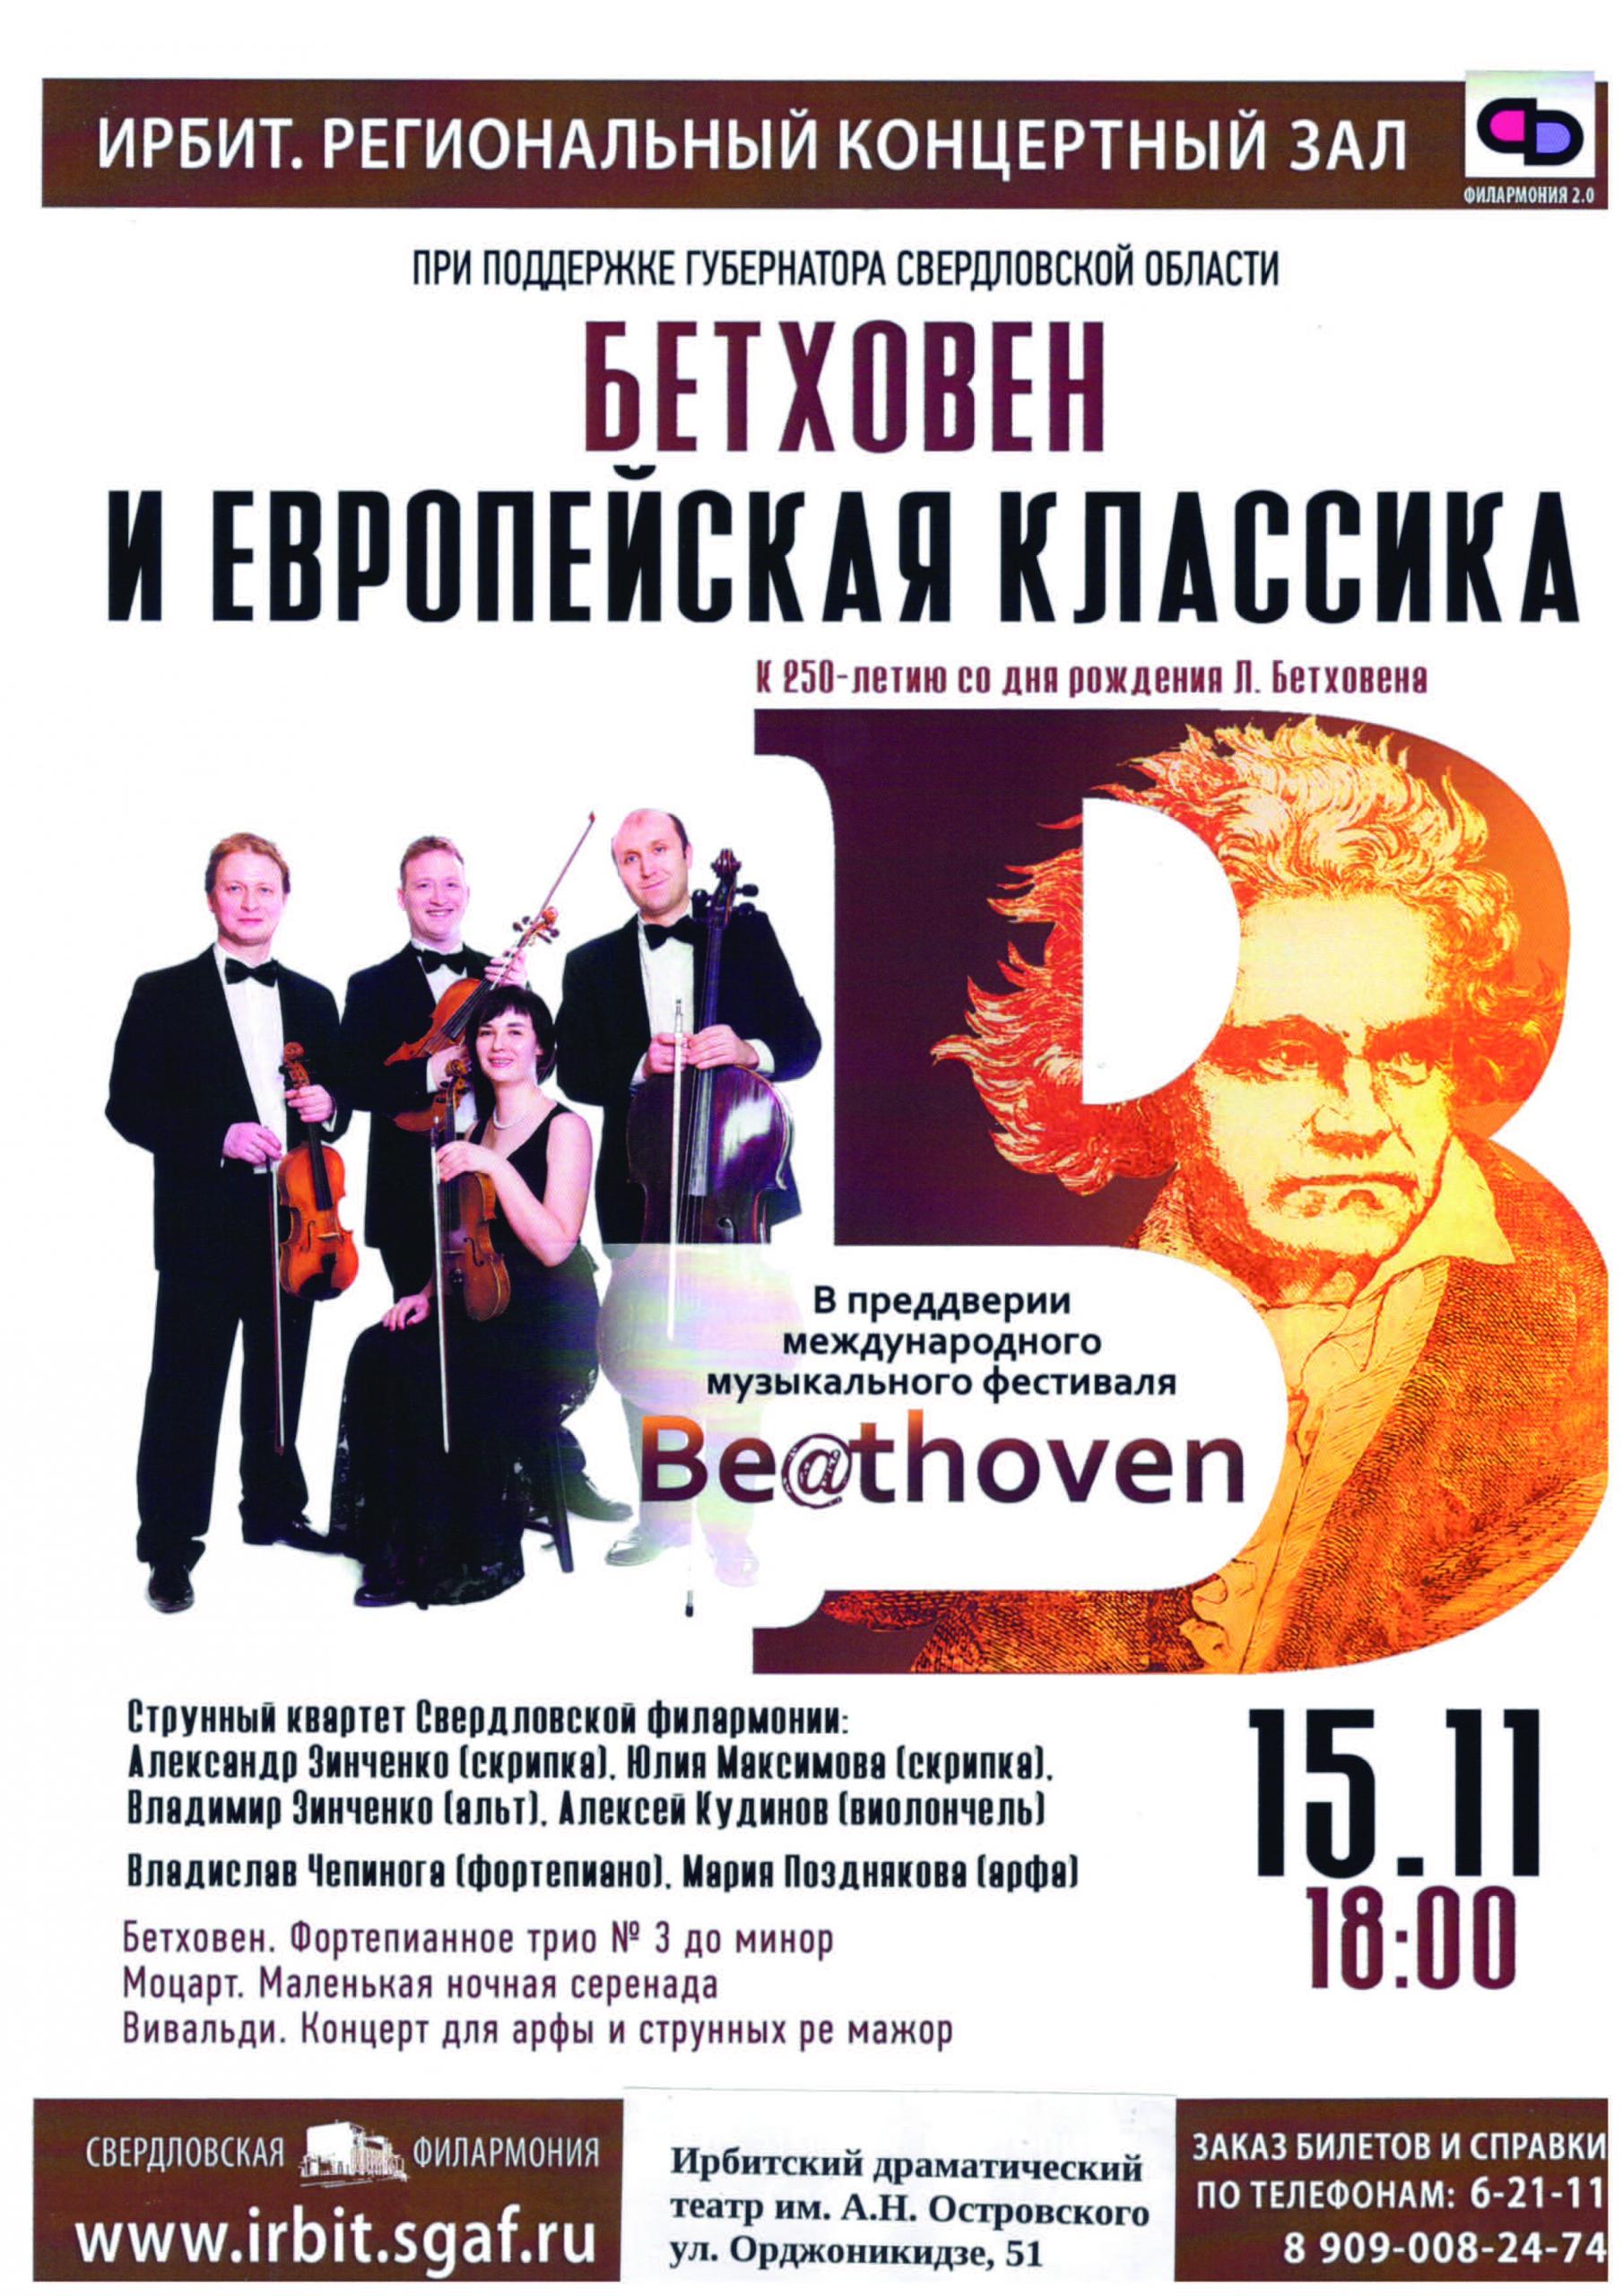 Бетховен и европейская классика